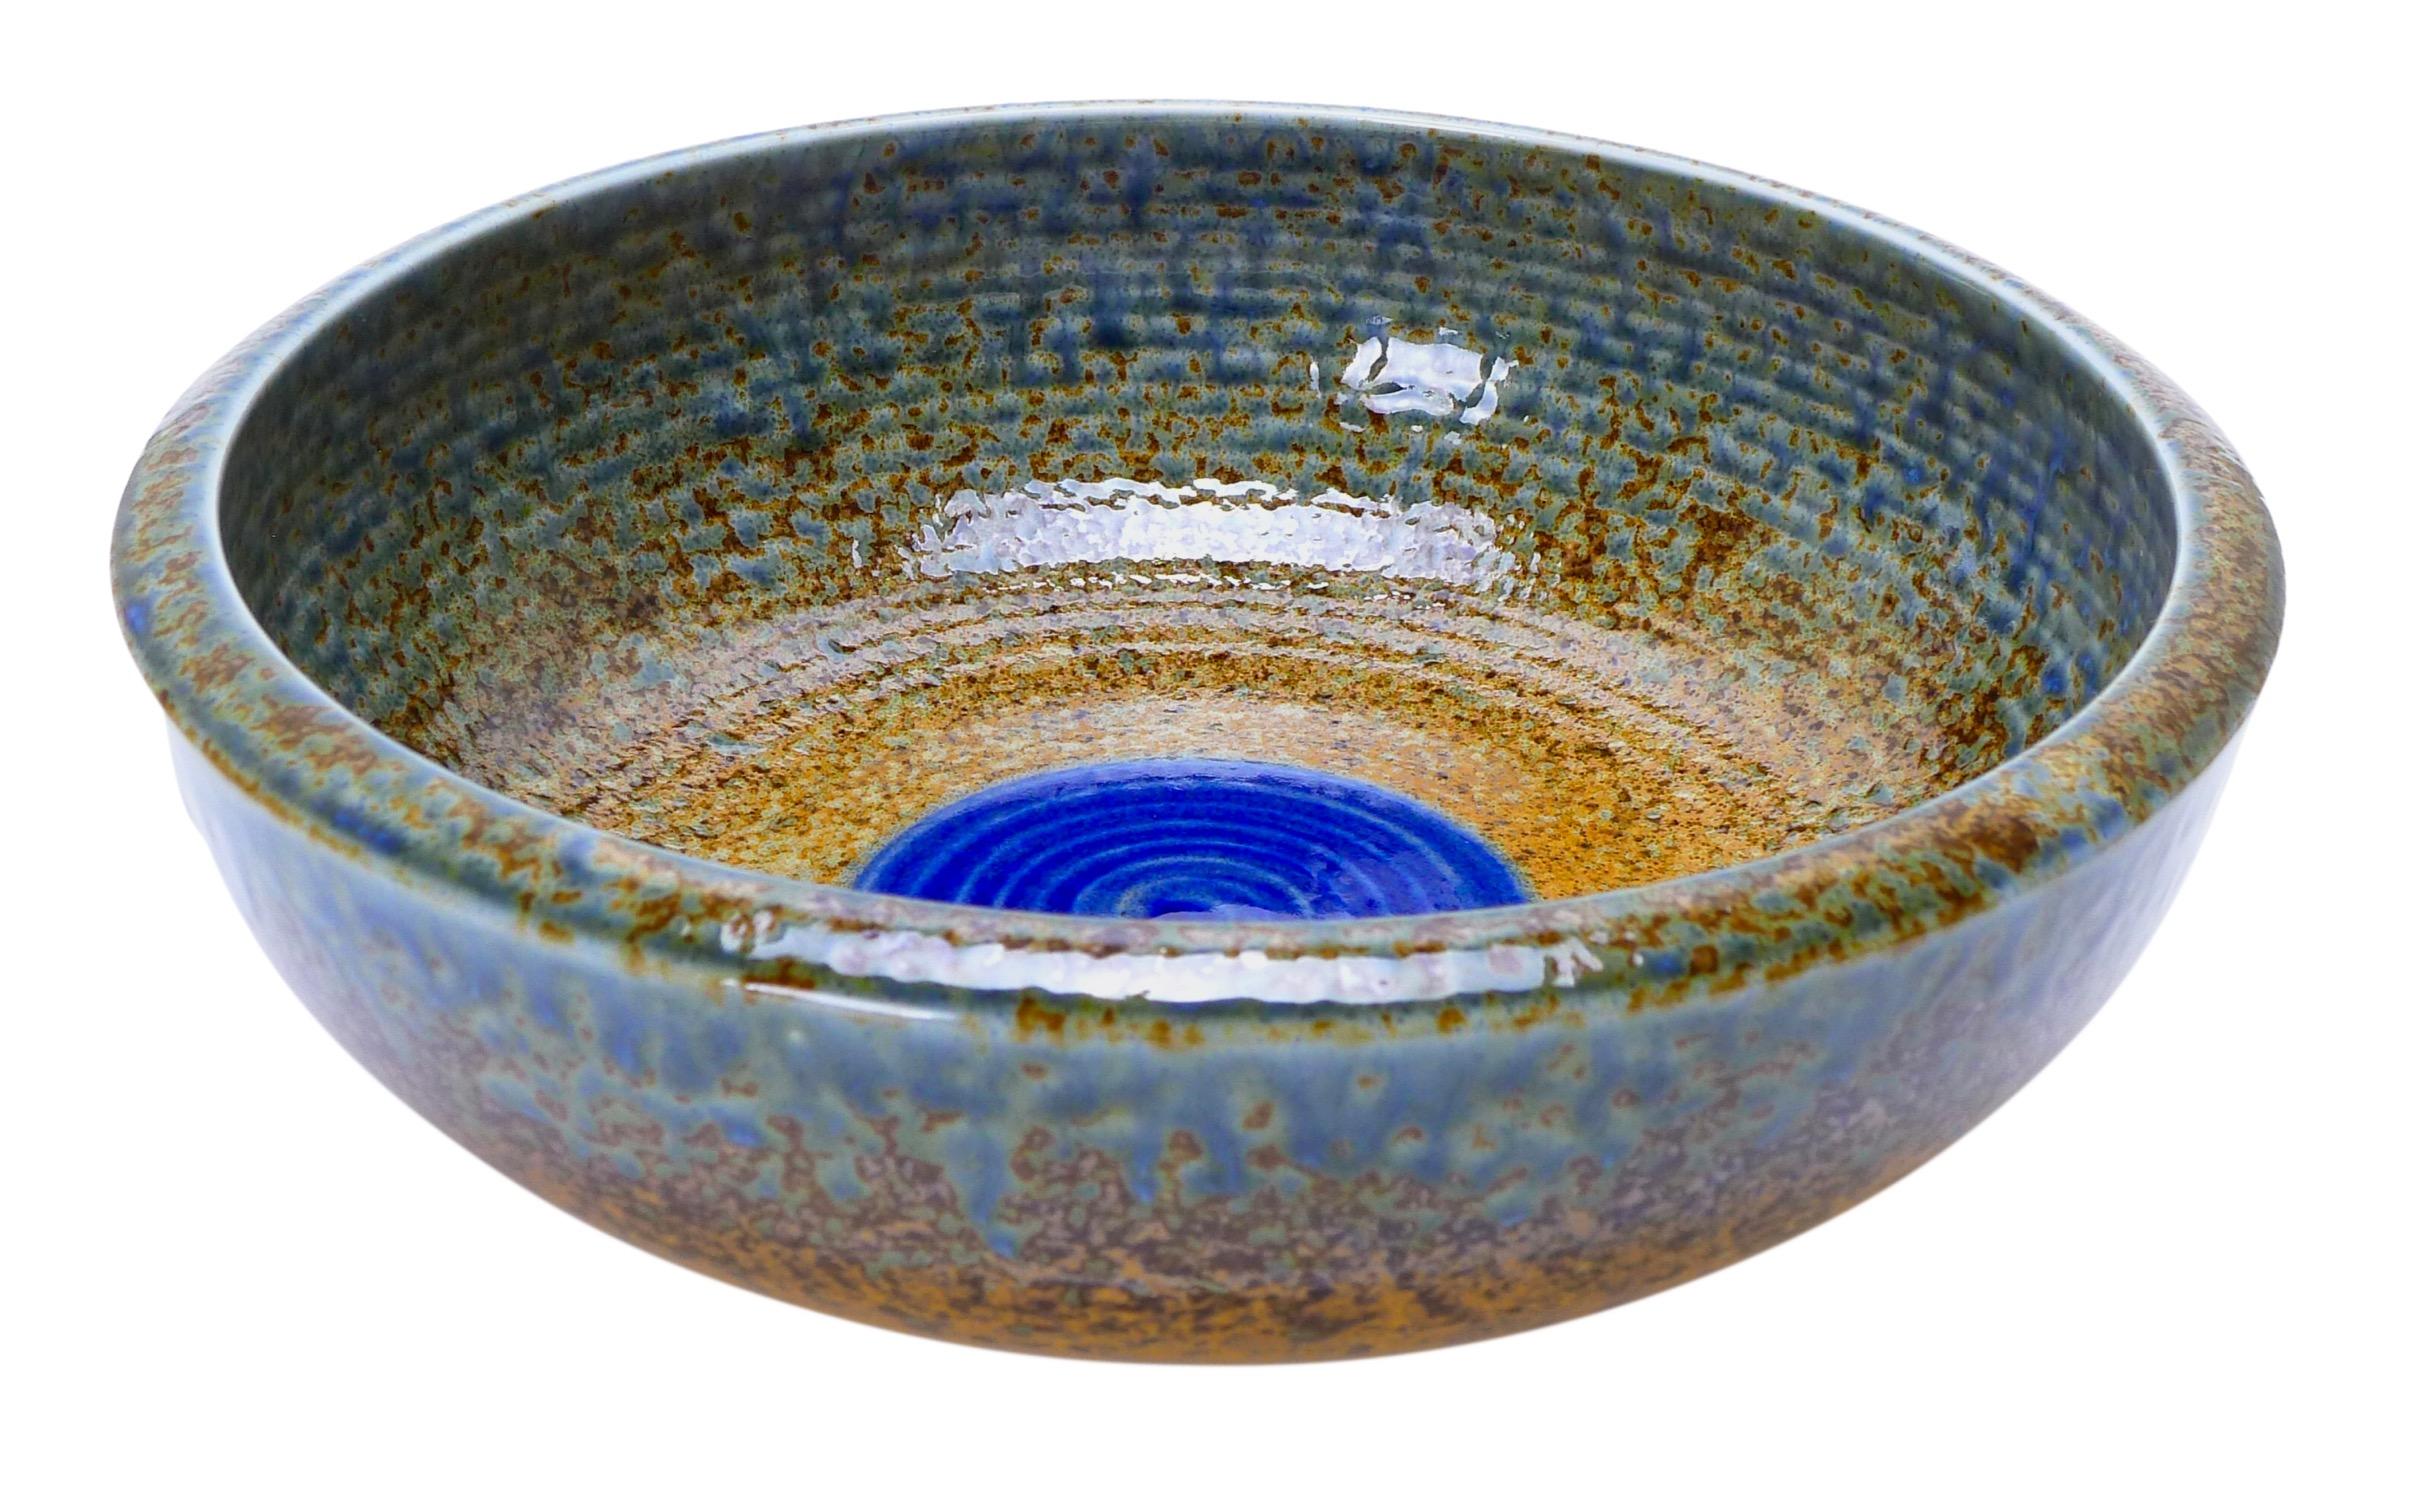 Image of Large Blue Stoneware Serving Bowl with Indigo Blue Dot, 9-1/2 Inch